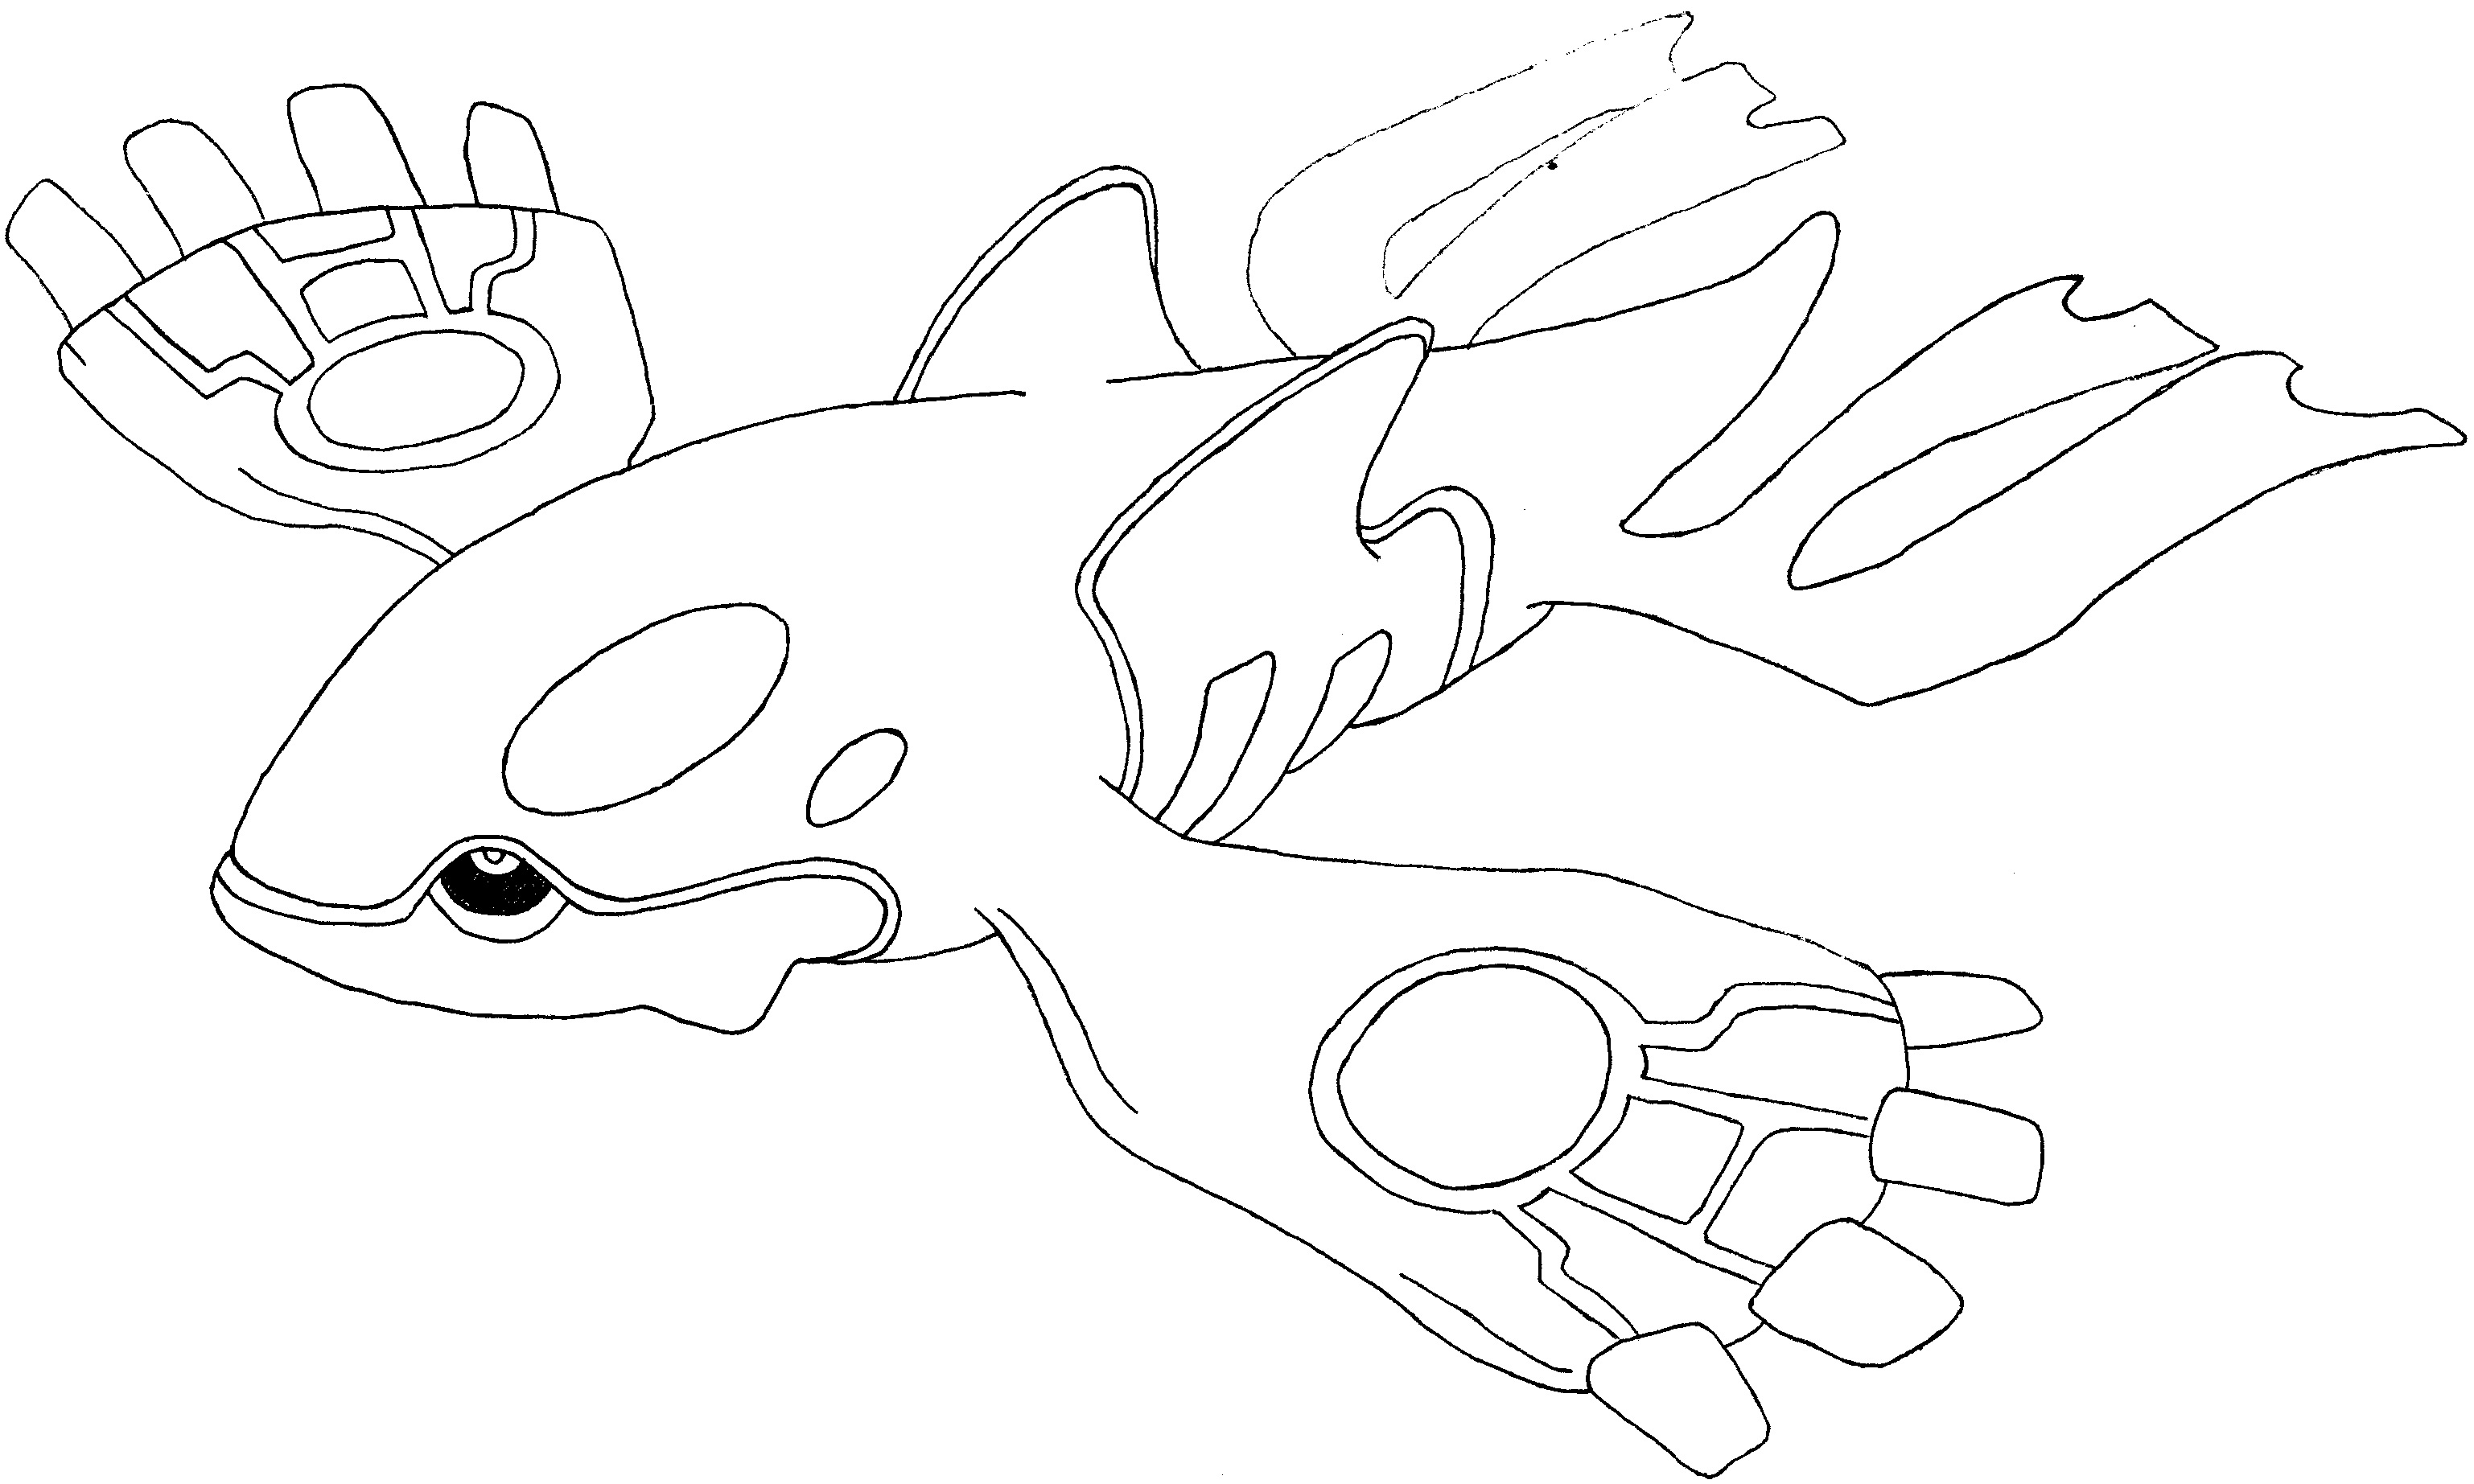 Pokemon Coloring Pages Primal Kyogre | Pokemon ausmalbilder ... | 1845x3075